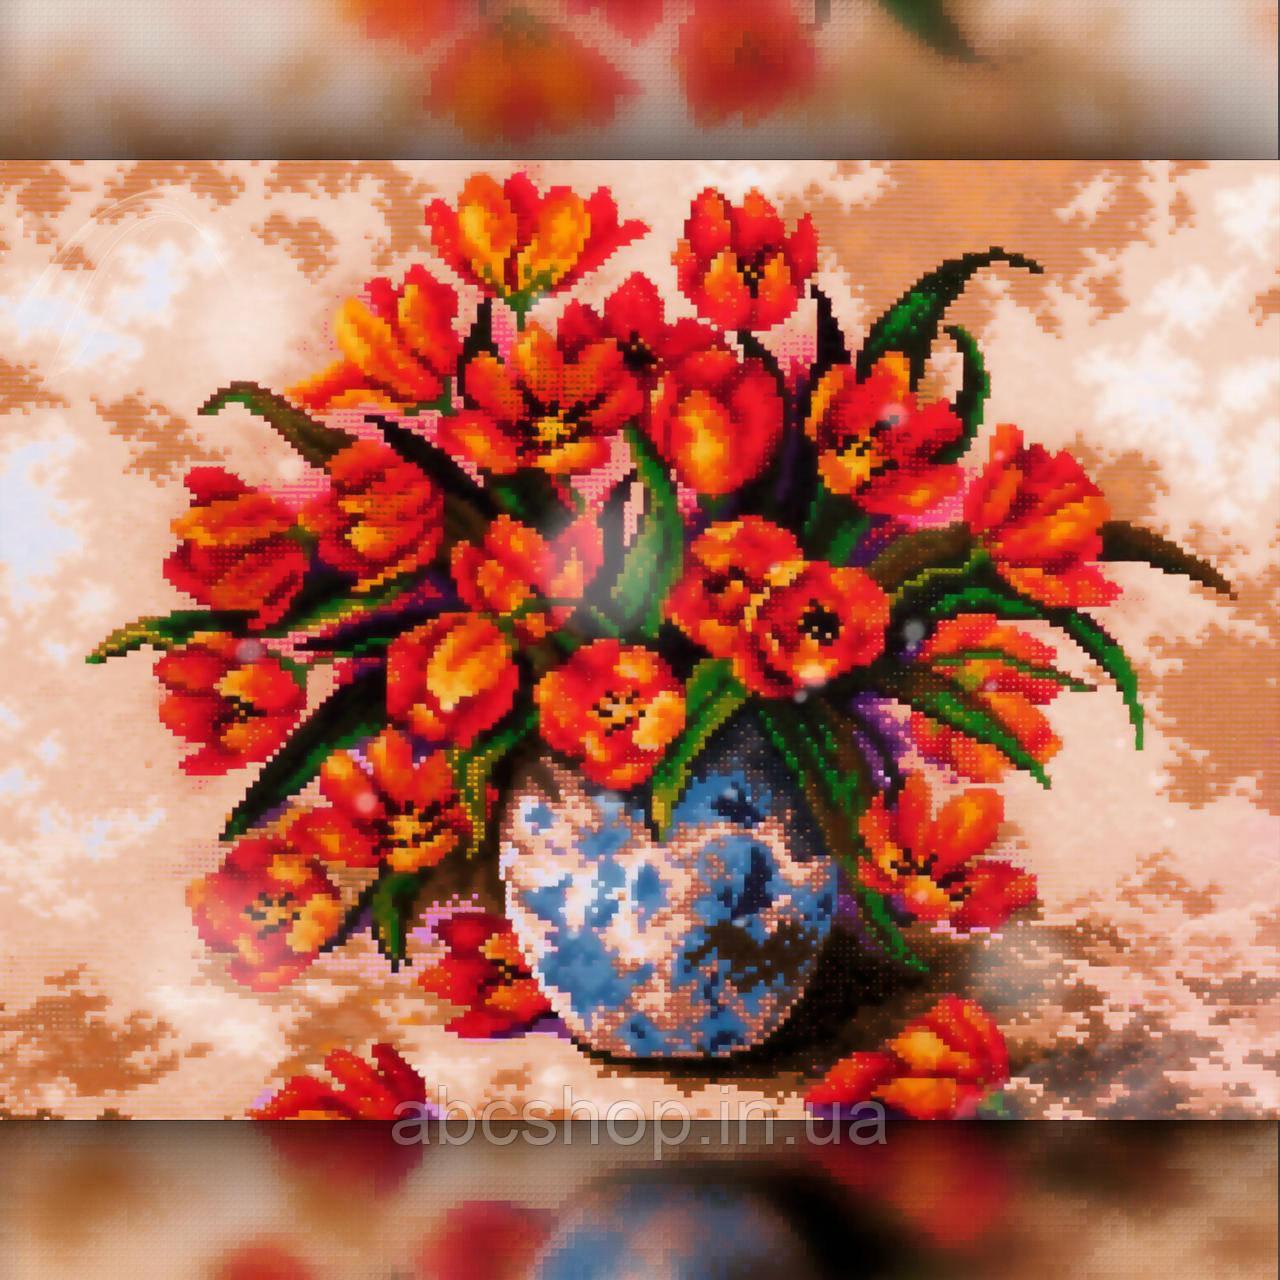 Алмазная вышивка Красные тюльпаны в вазе 30x40 The Wortex Diamonds (TWD10071)